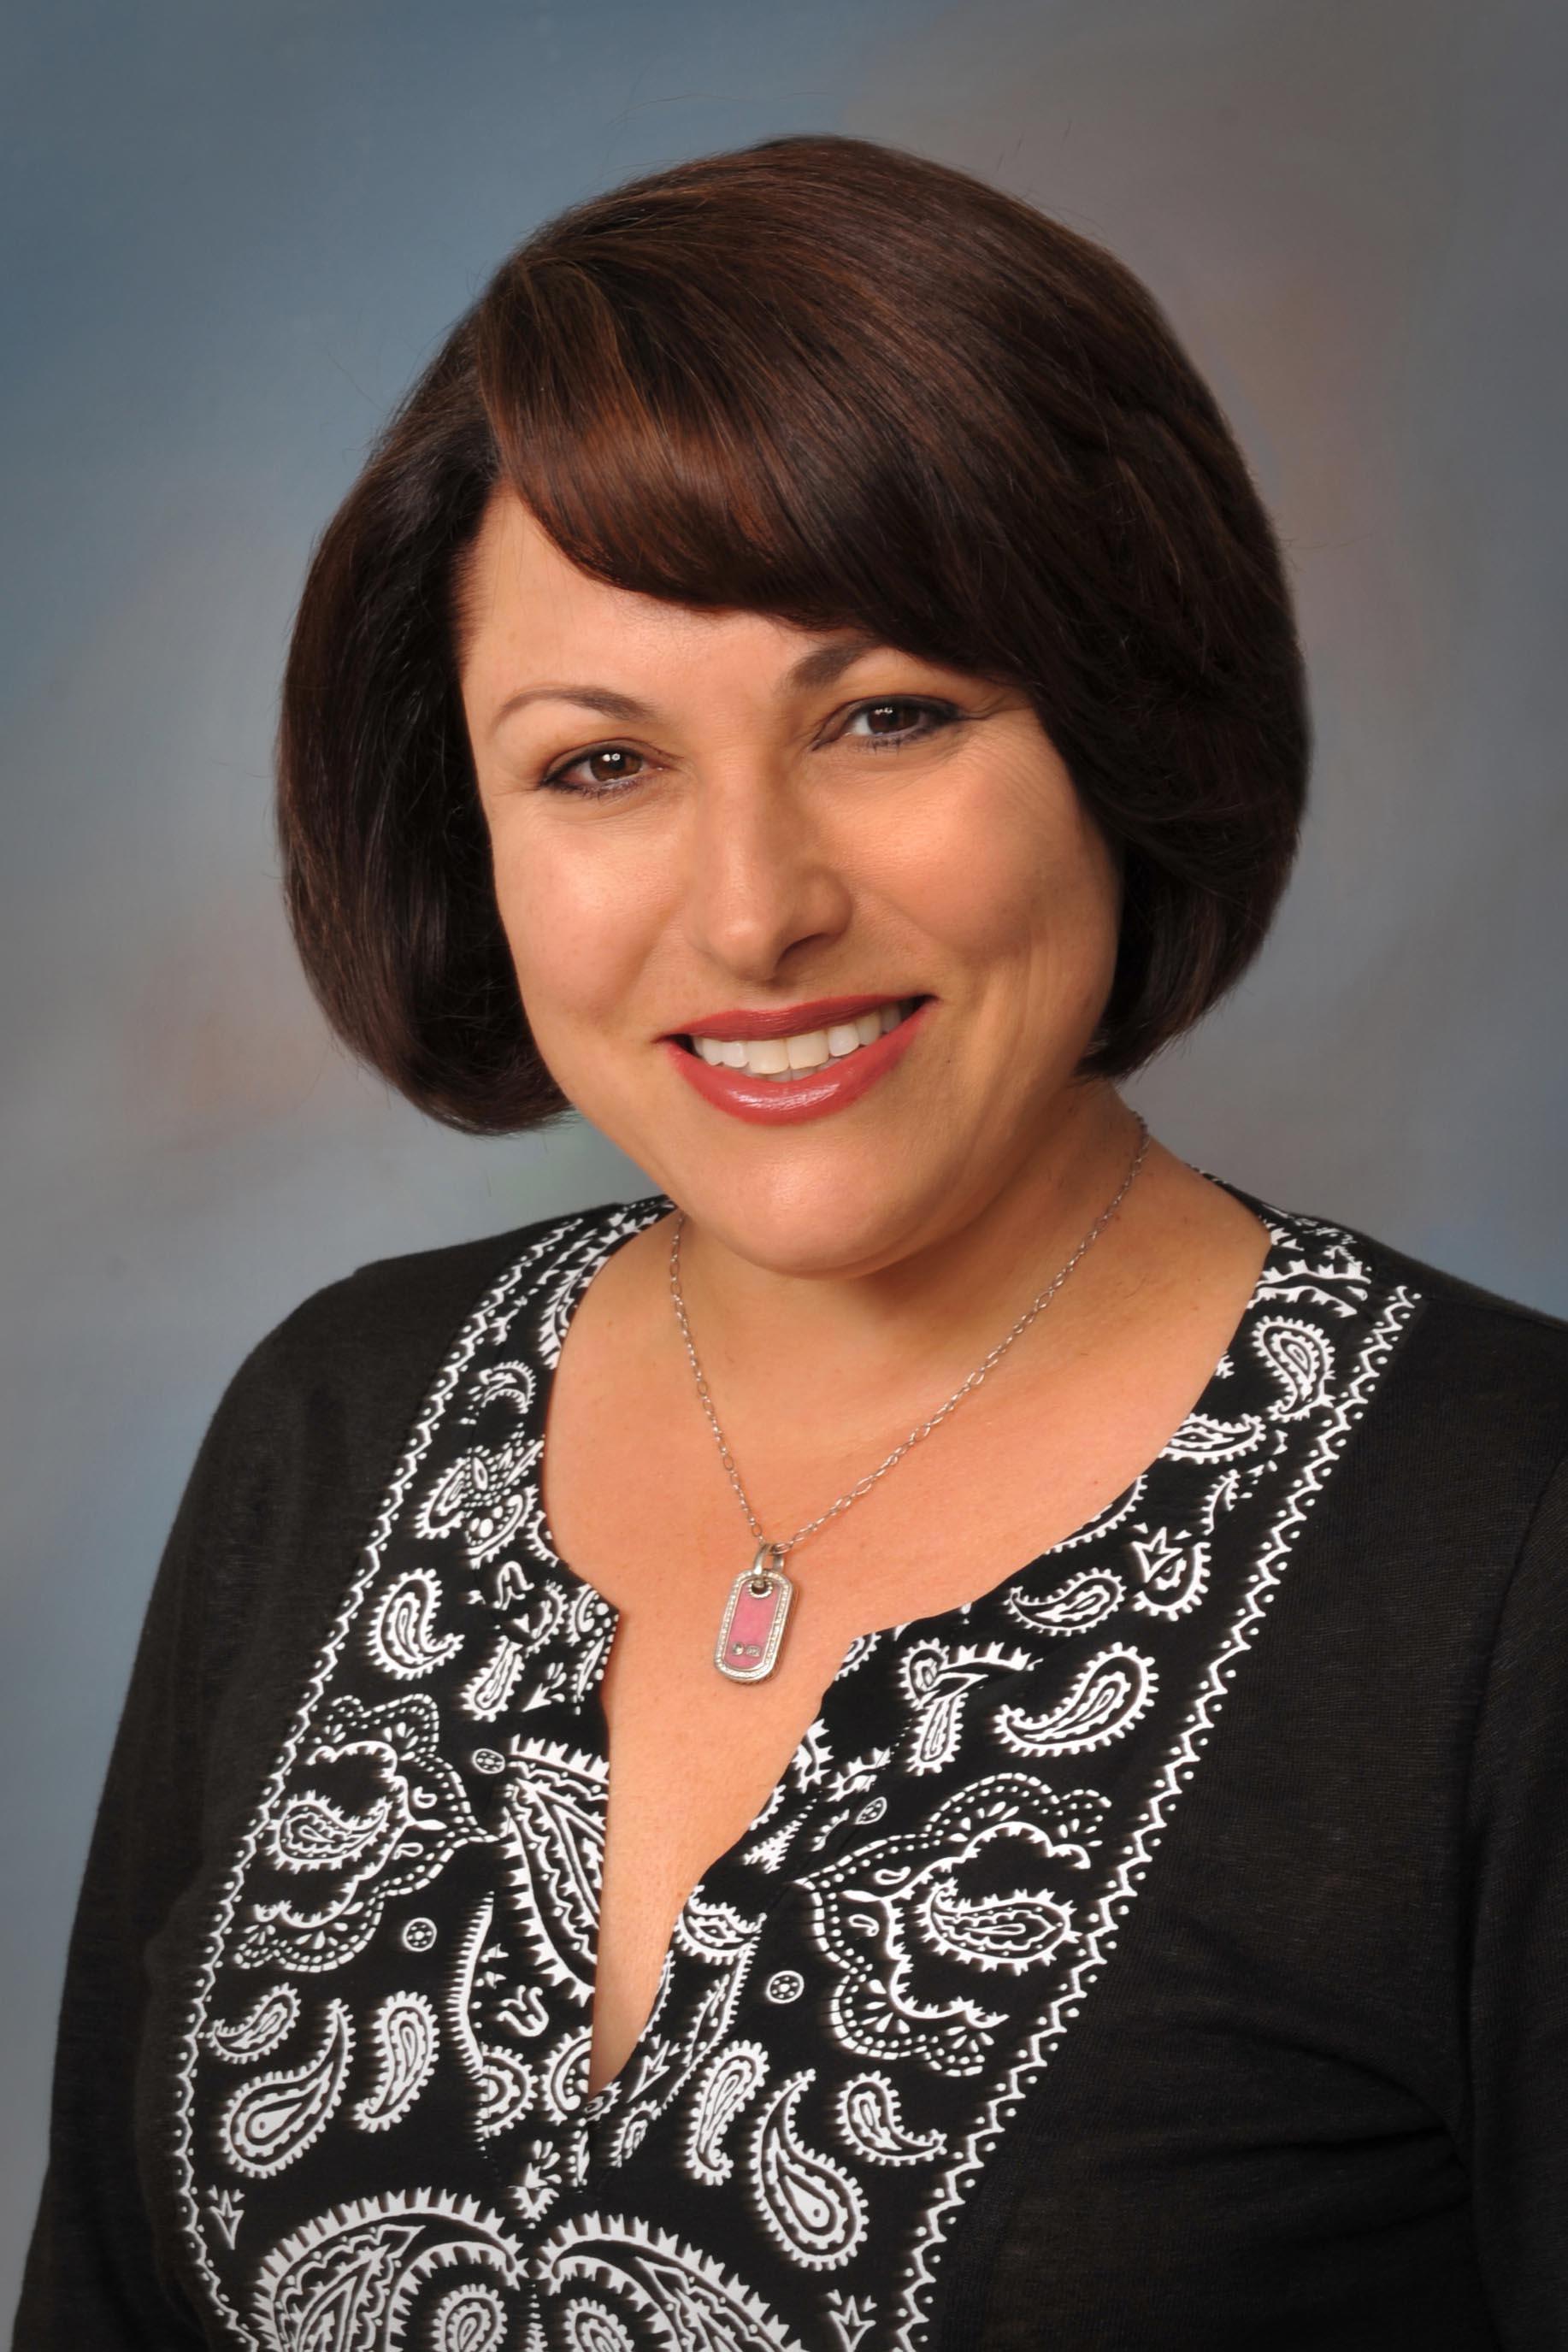 Dr Deanna Solodko PsyD, LMHC